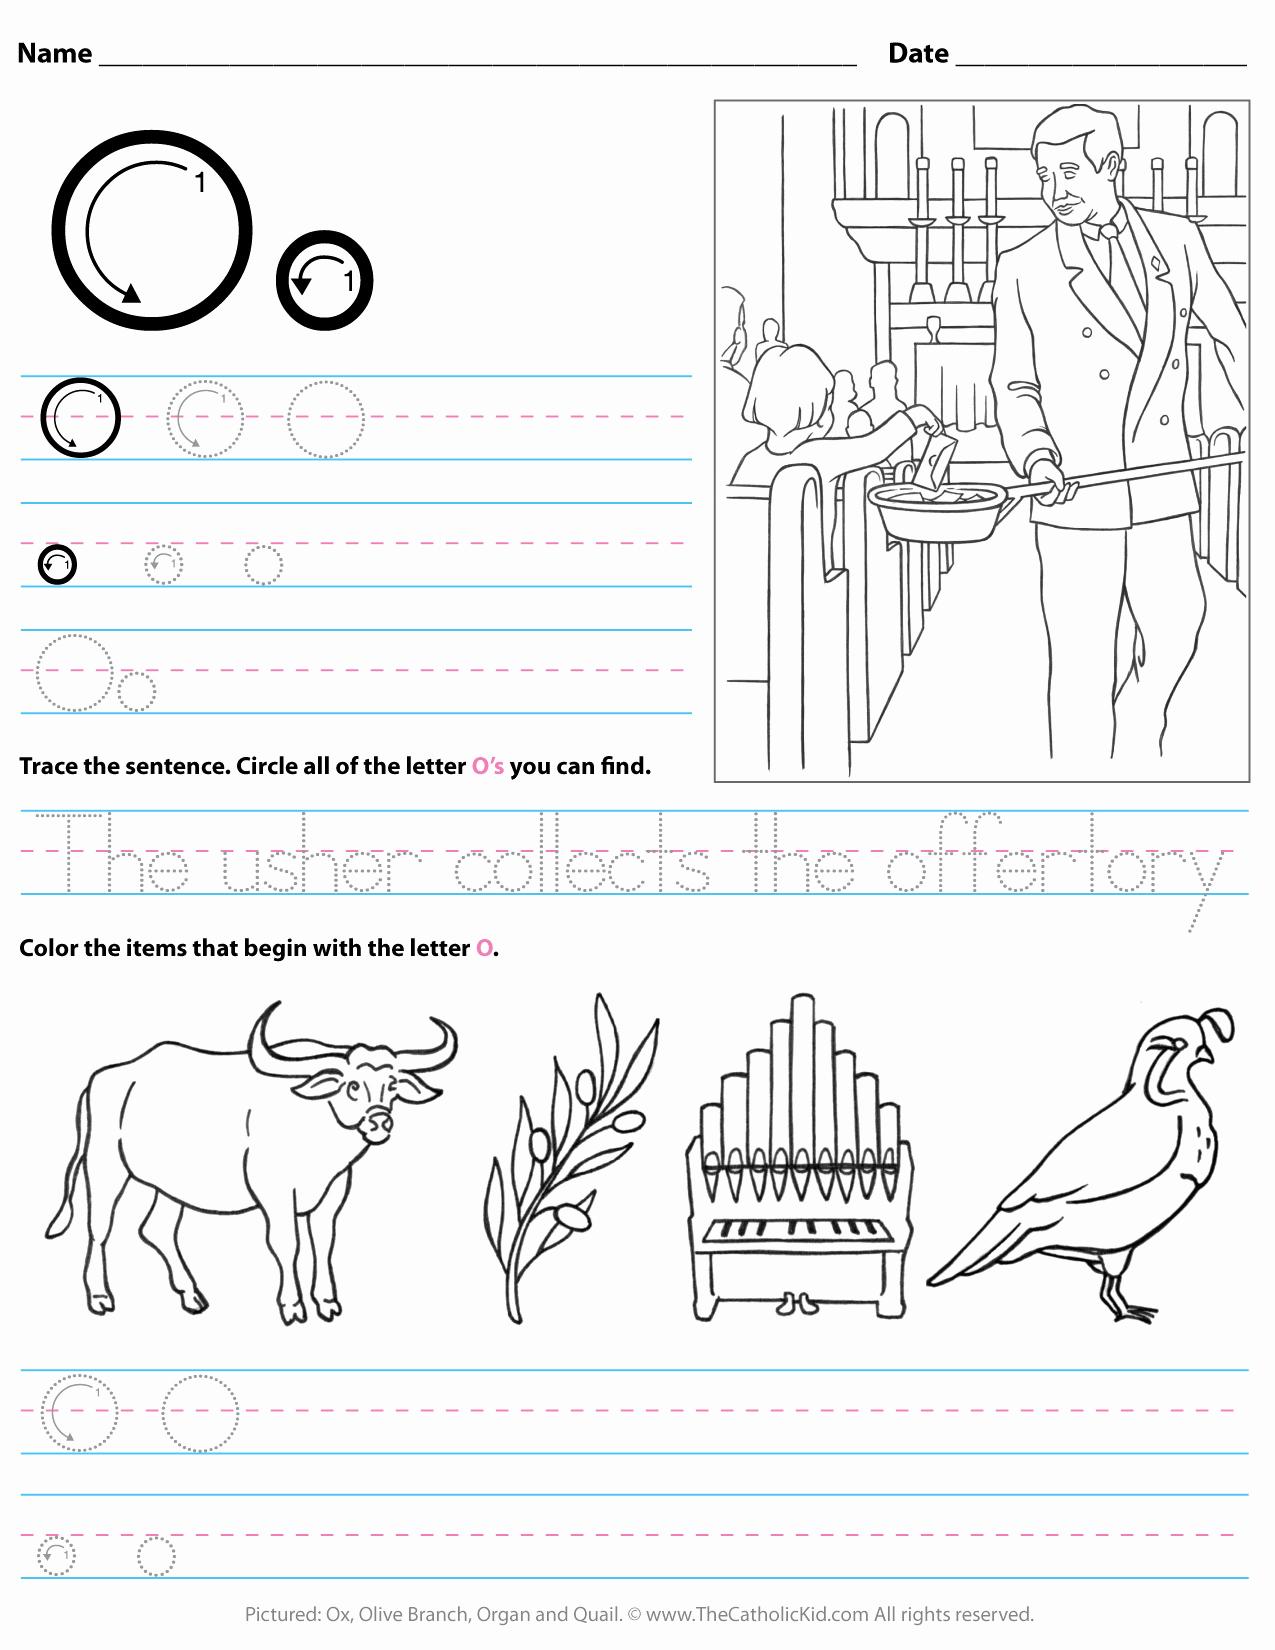 Letter O Worksheet for Kindergarten Awesome Catholic Alphabet Letter O Worksheet Preschool Kindergarten